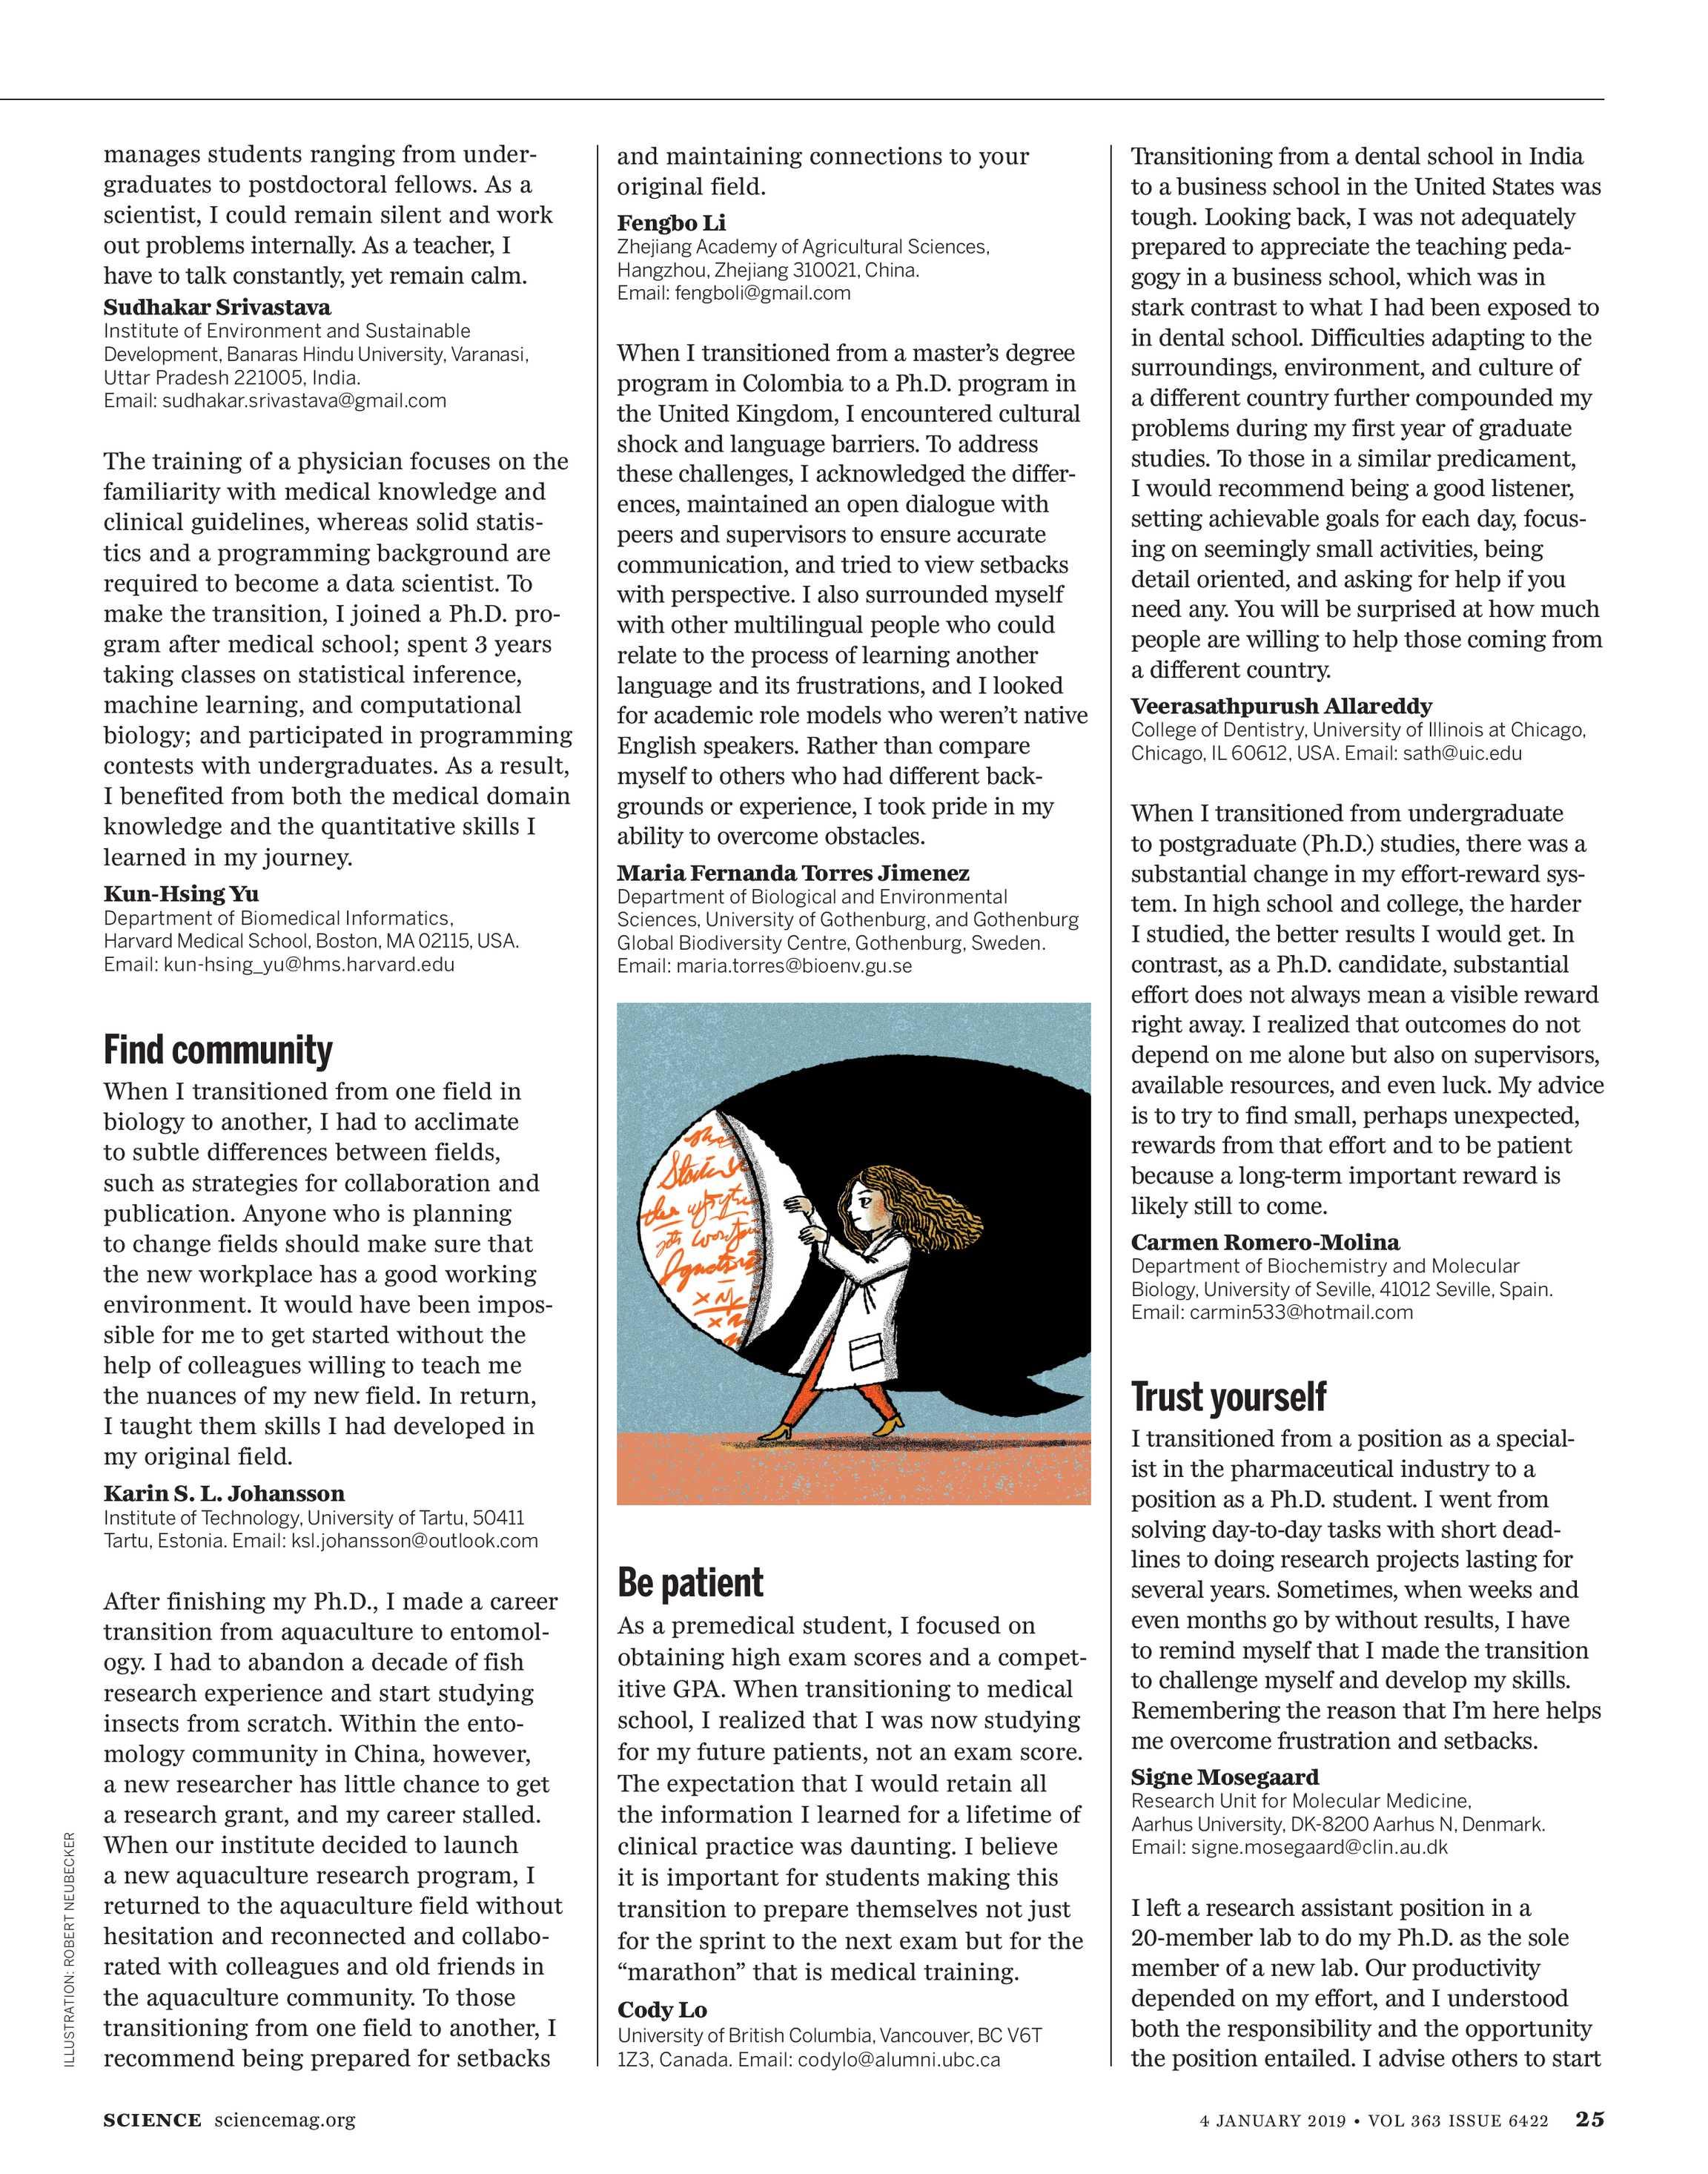 Science Magazine - January 4, 2019 - page 25